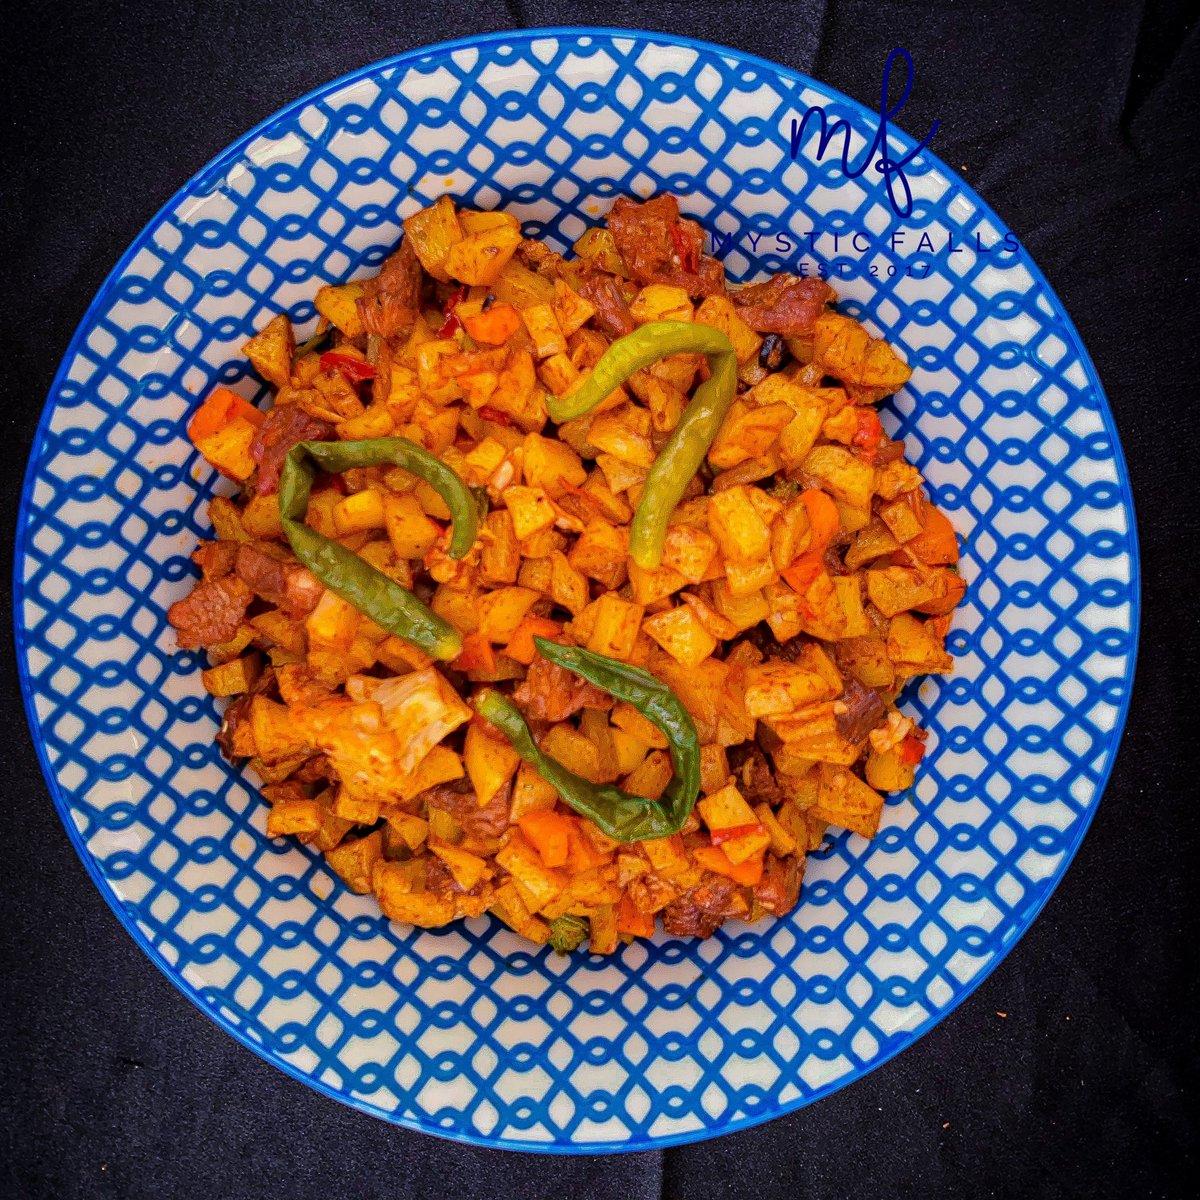 POTATO KABAB #kano #food #arewa #nigeria #chef #bellanaija #weddings #events #kaduna #hausaa_fulanii #hausawedding #friedrice #chicken #salad #jollofrice #party #partyjollof #pepperedchicken #Shawarma #yummy #photography #foodporn #foodphotography #hausaroom #northernhibiscuspic.twitter.com/qjPsOofGYU